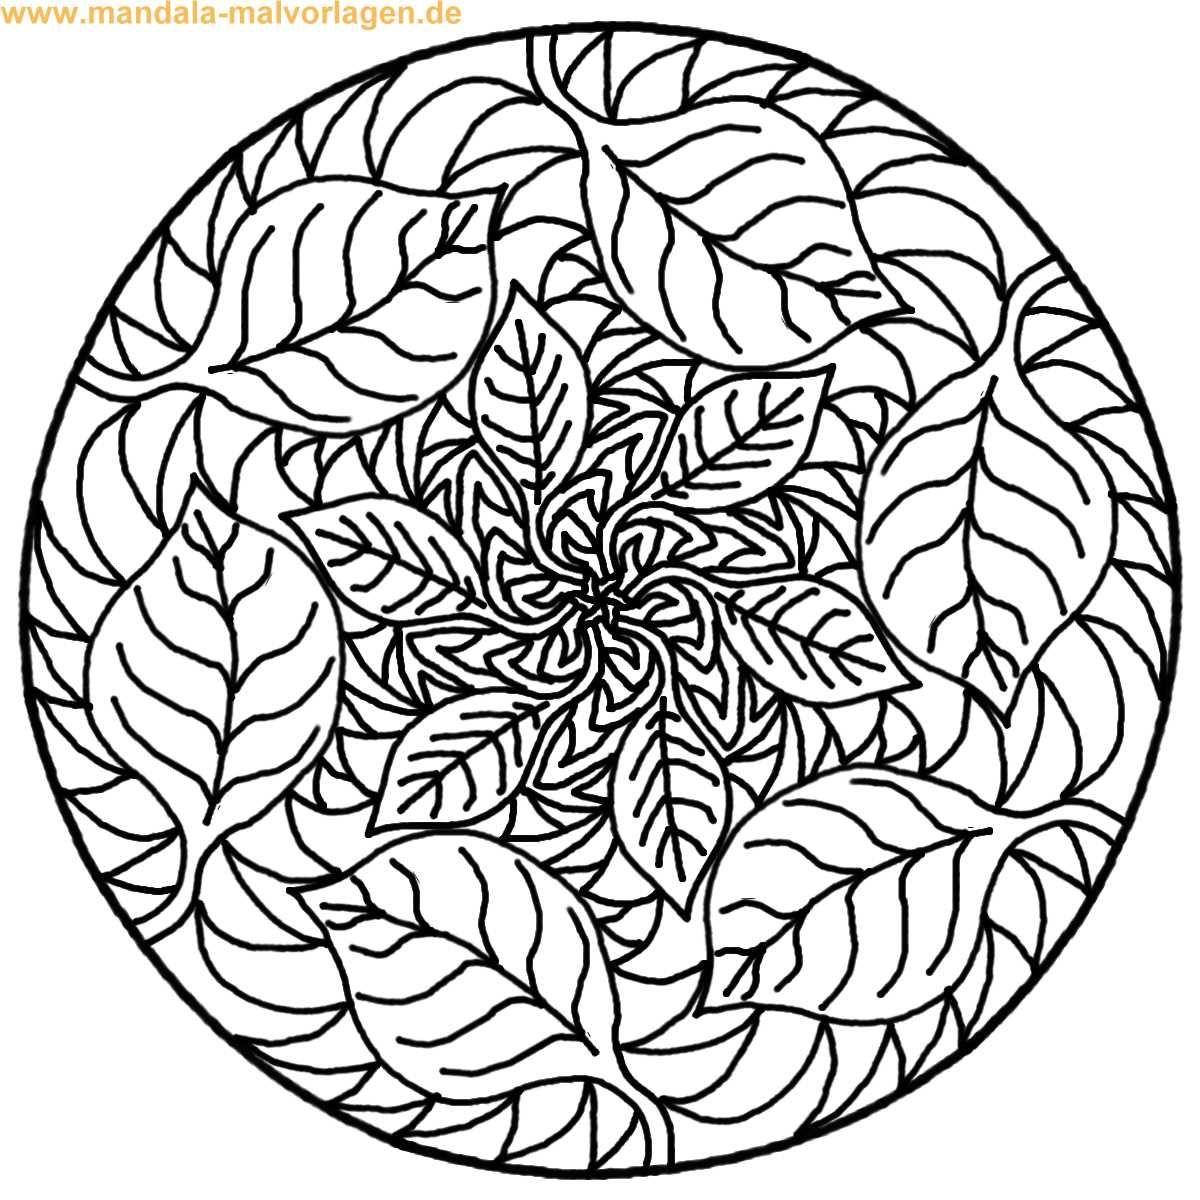 mandala vorlage zum 1200 1200 tattoos pinterest mandala zum ausmalen. Black Bedroom Furniture Sets. Home Design Ideas